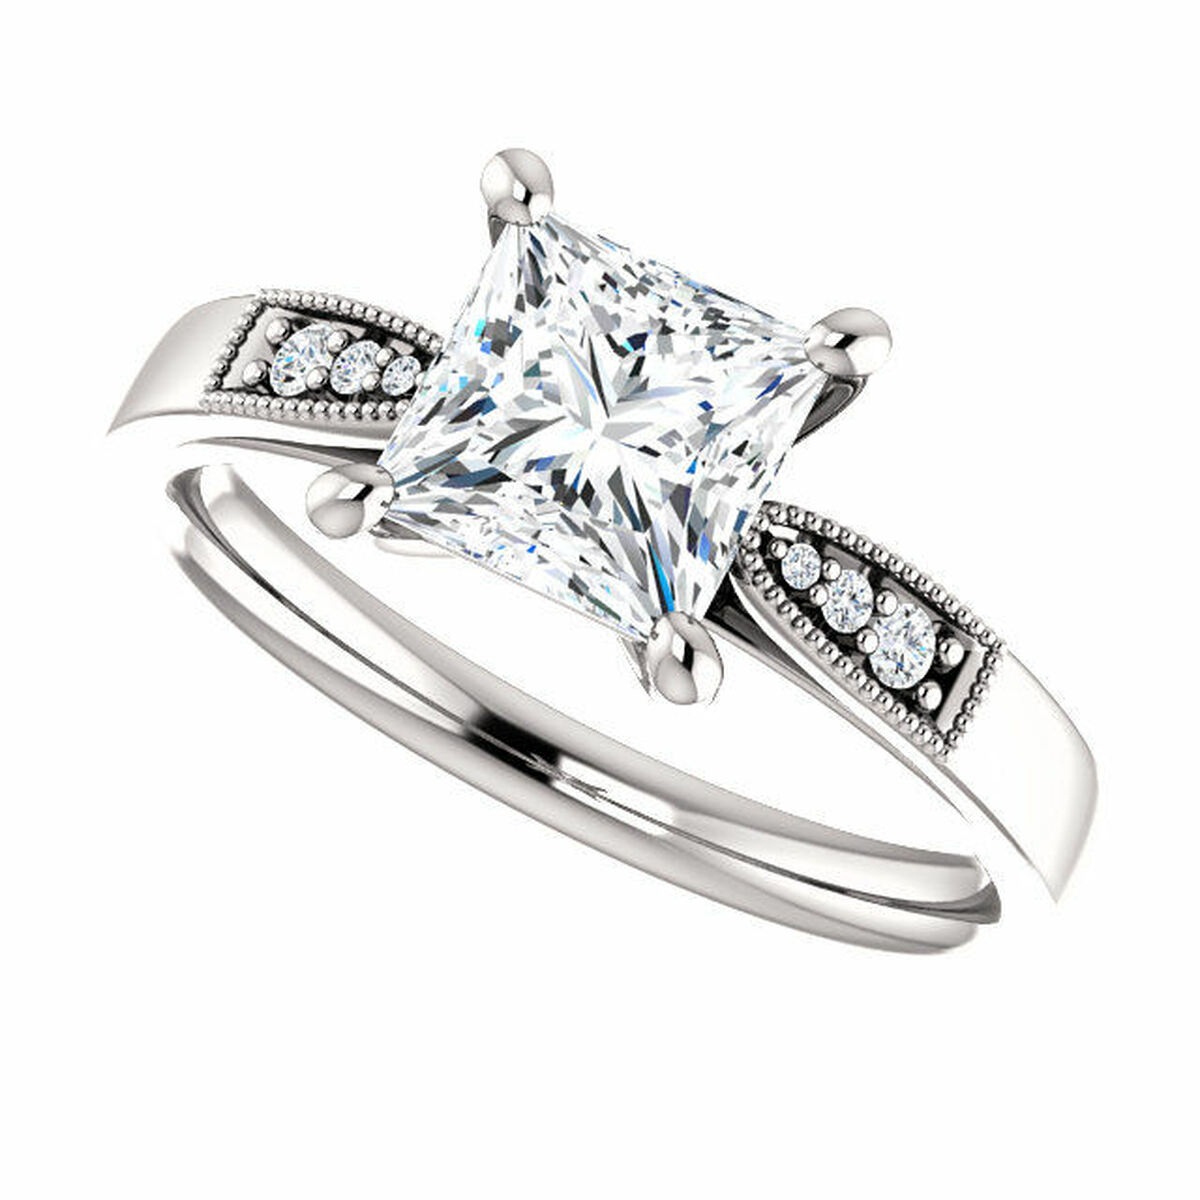 Princess Cut Diamond Accent Engagement Ring Princess Jewelry